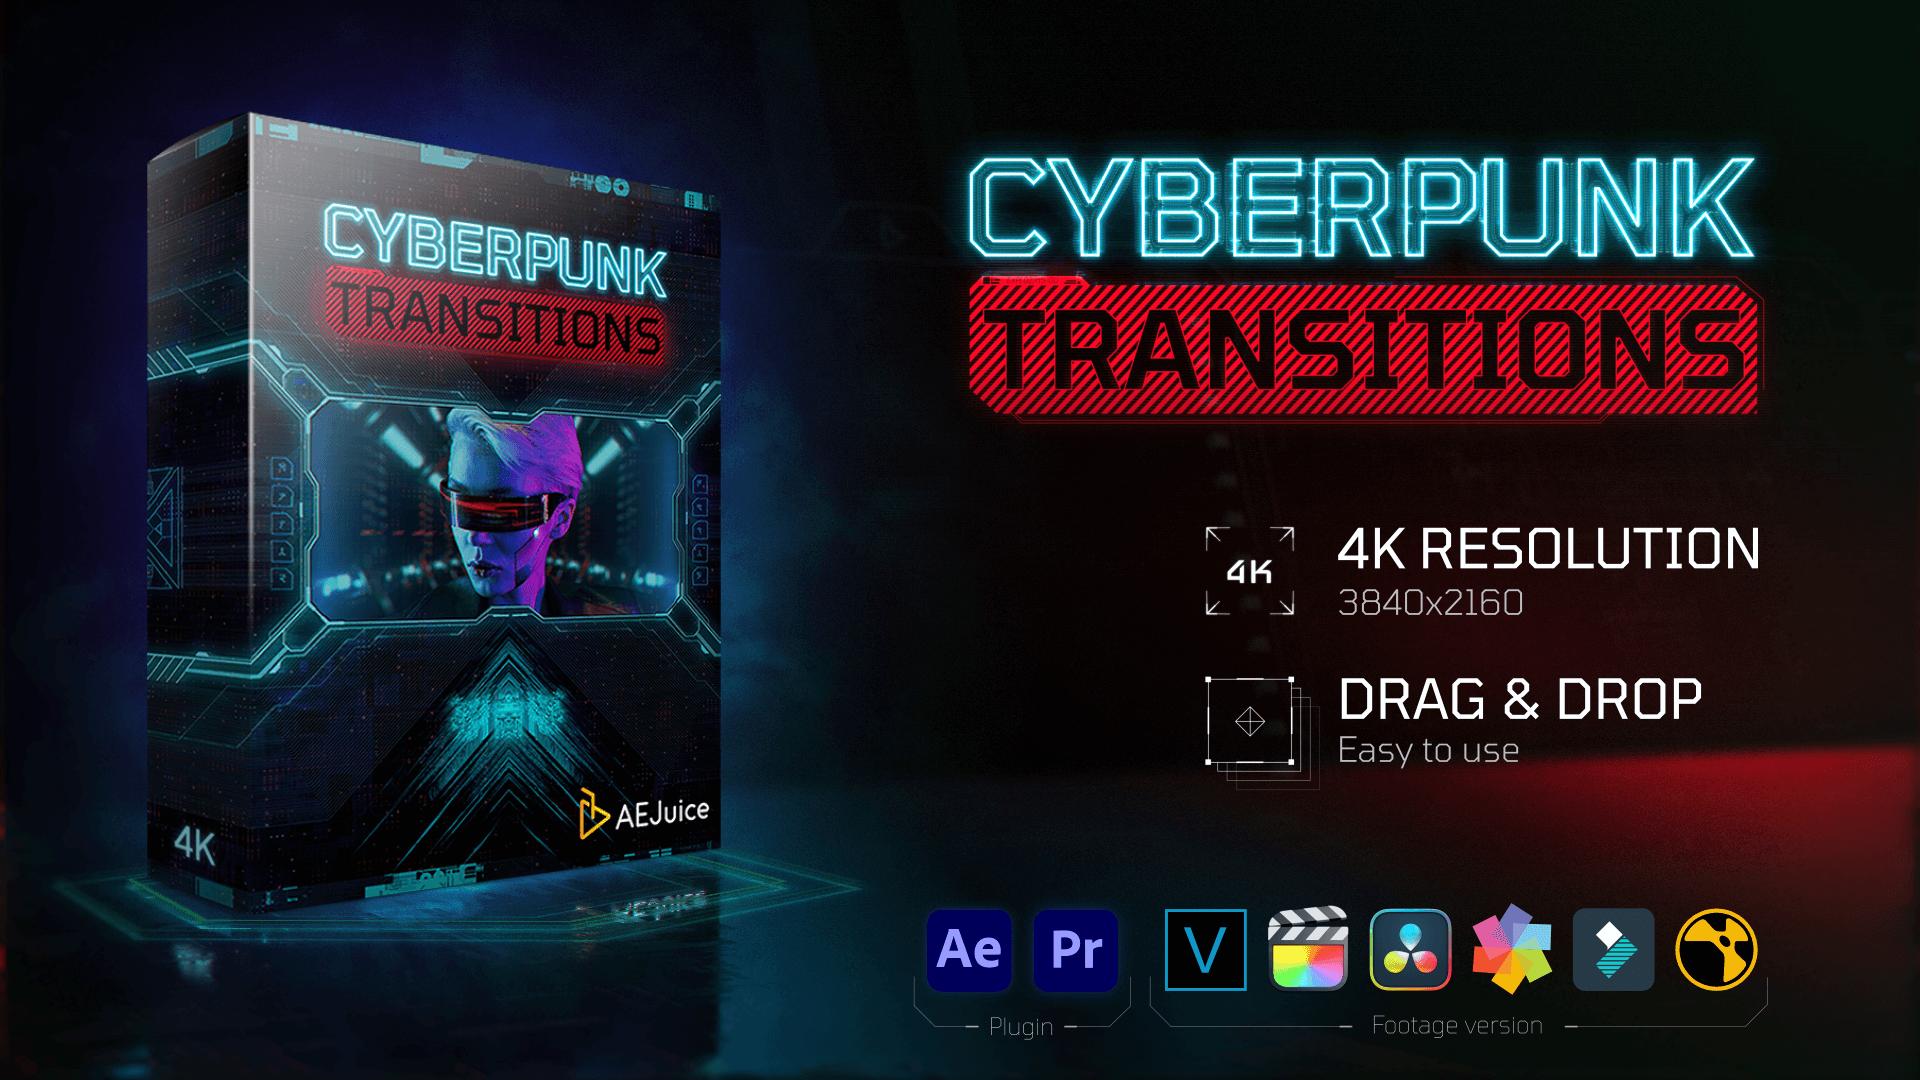 Cyberpunk Transitions